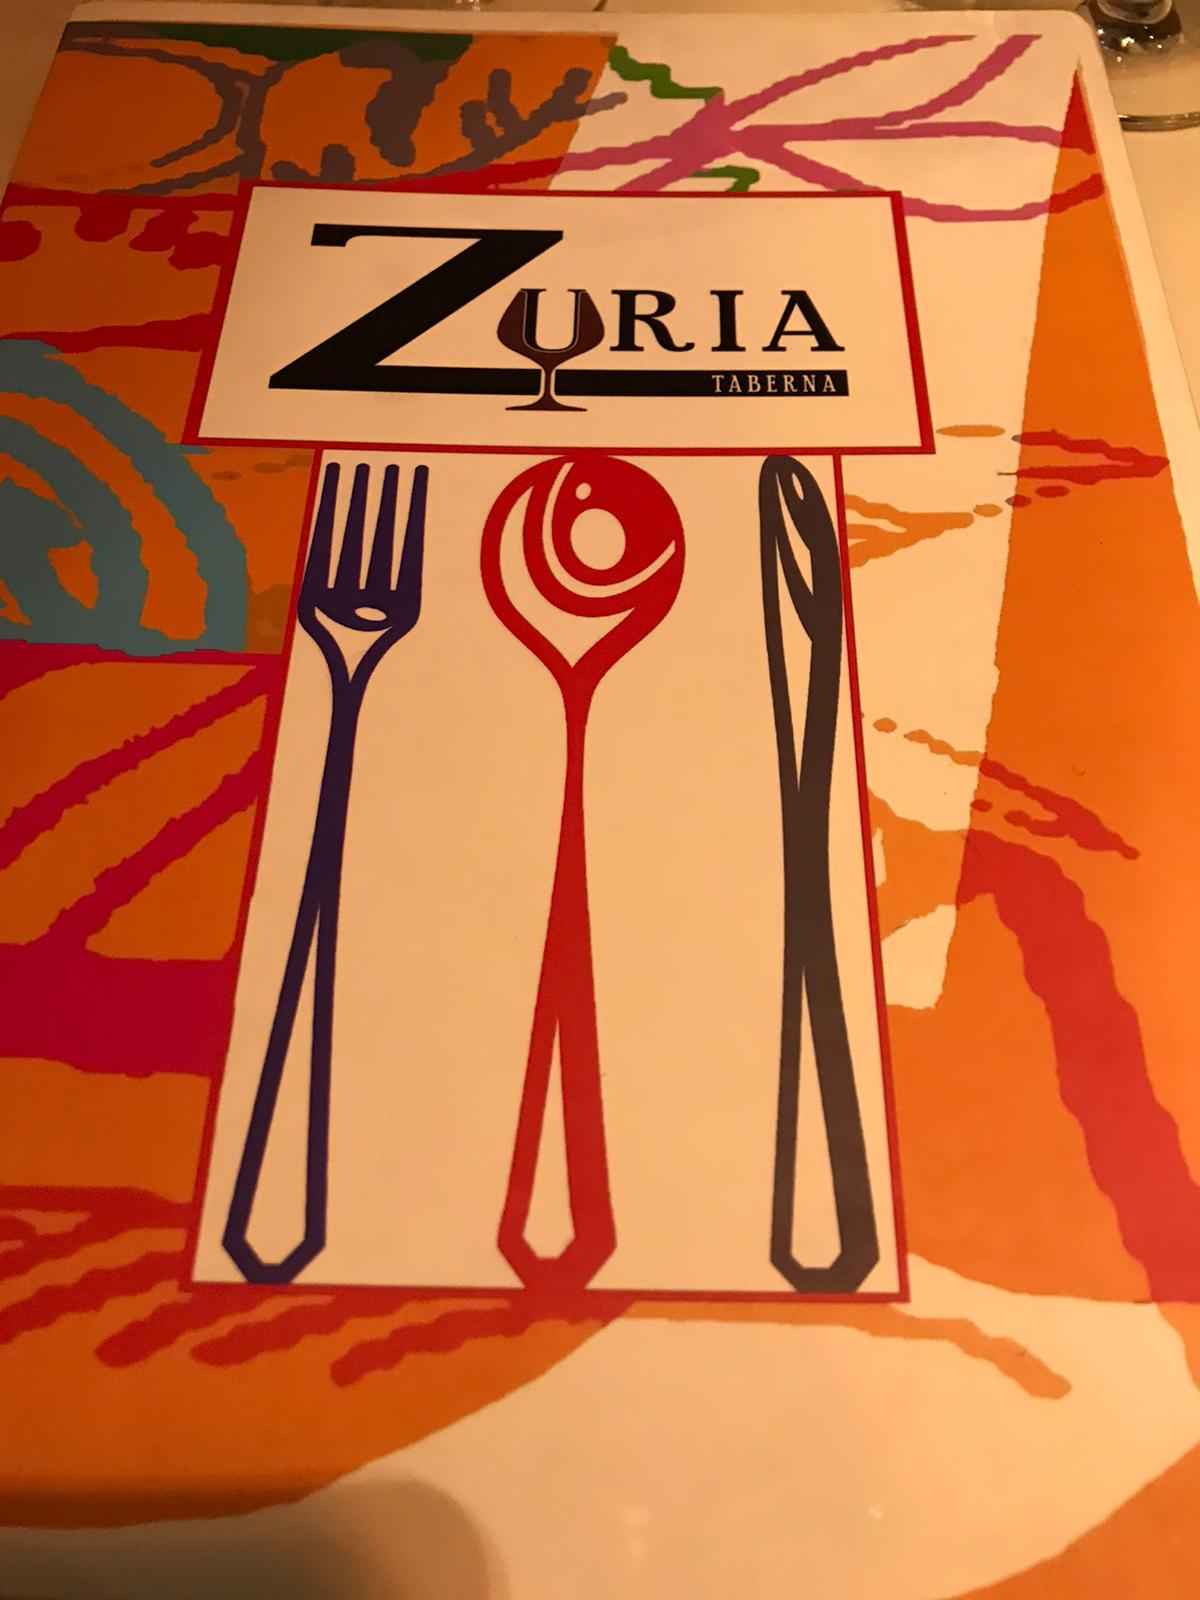 Reseña Gastronómica: Restaurante Taberna Zuria de Madrid 2